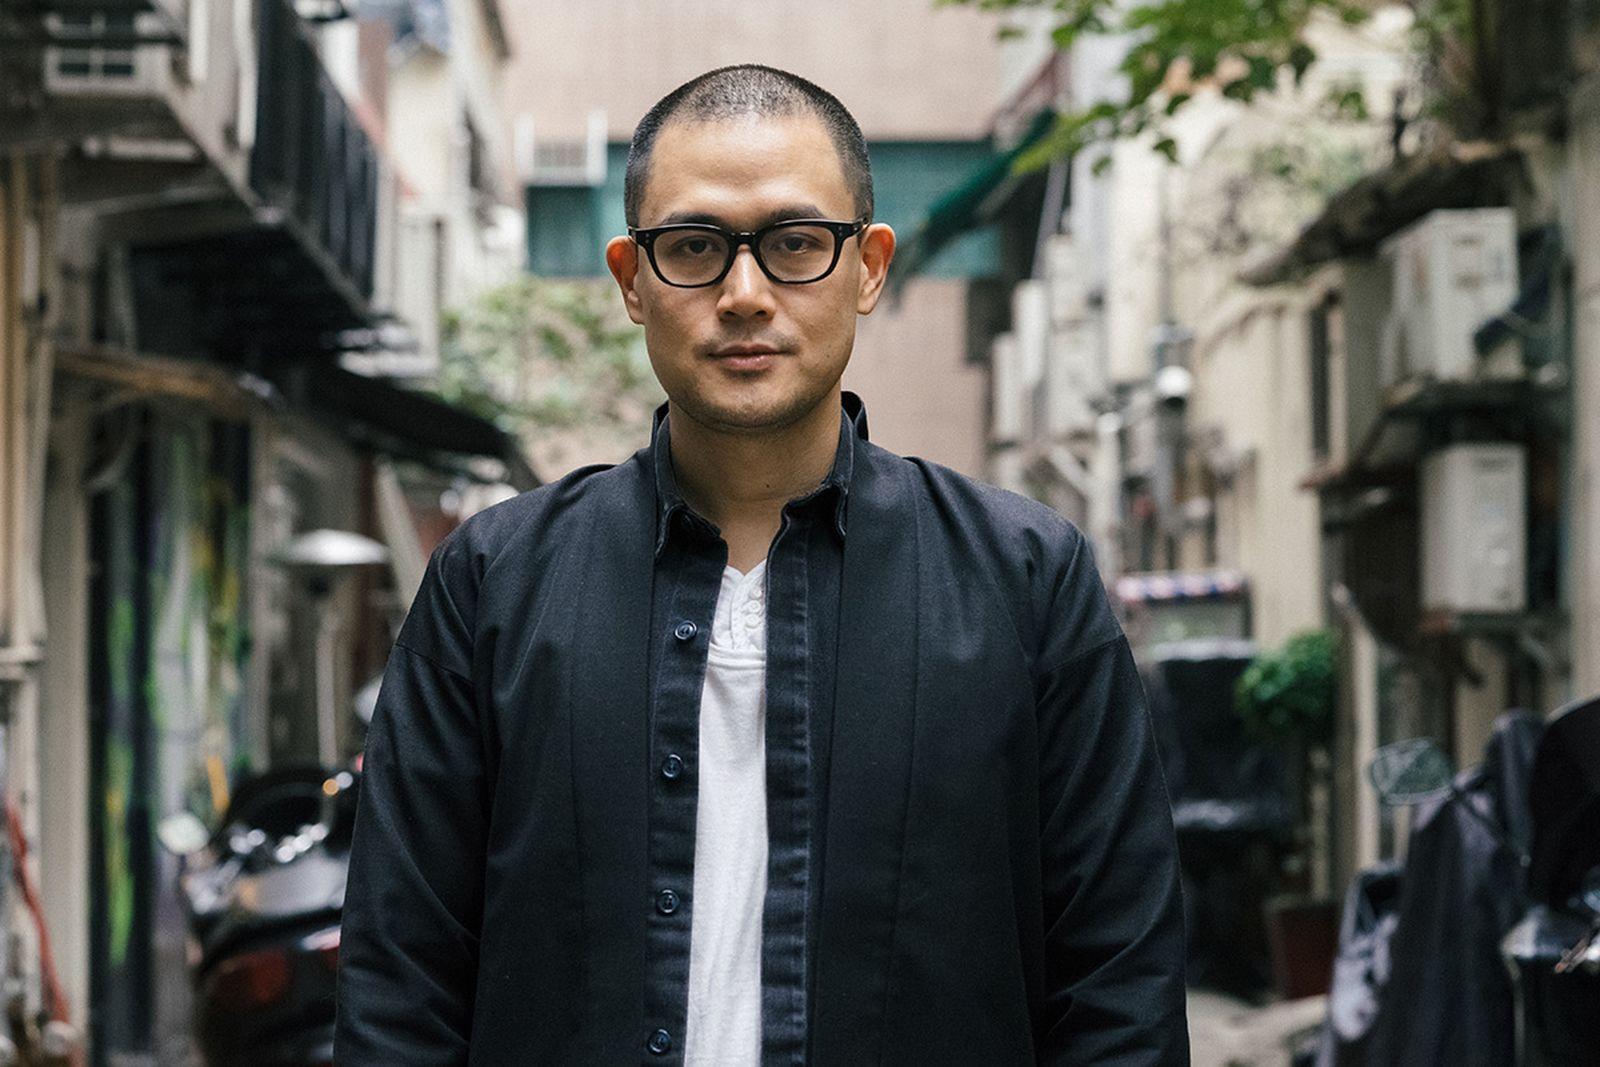 kevin-poon-braun-hong-kong-interview-02